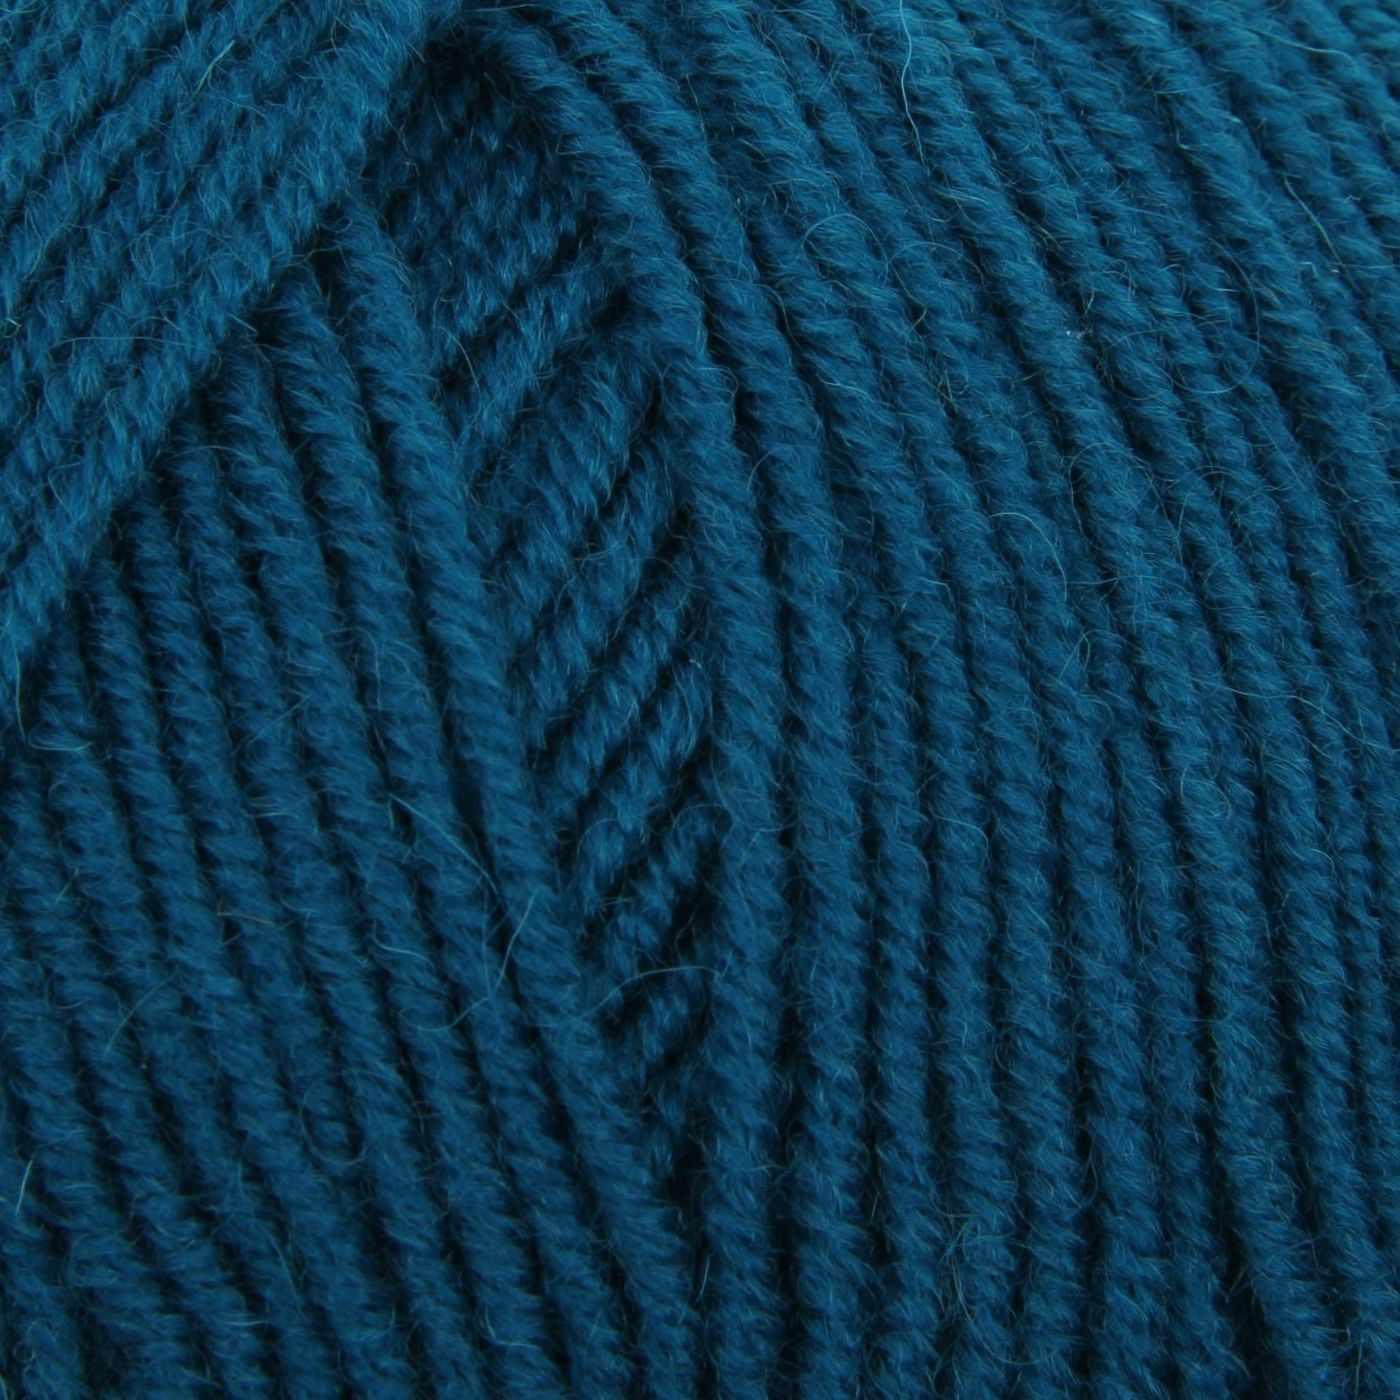 Пряжа  Удачная Цвет.14 Морская волна